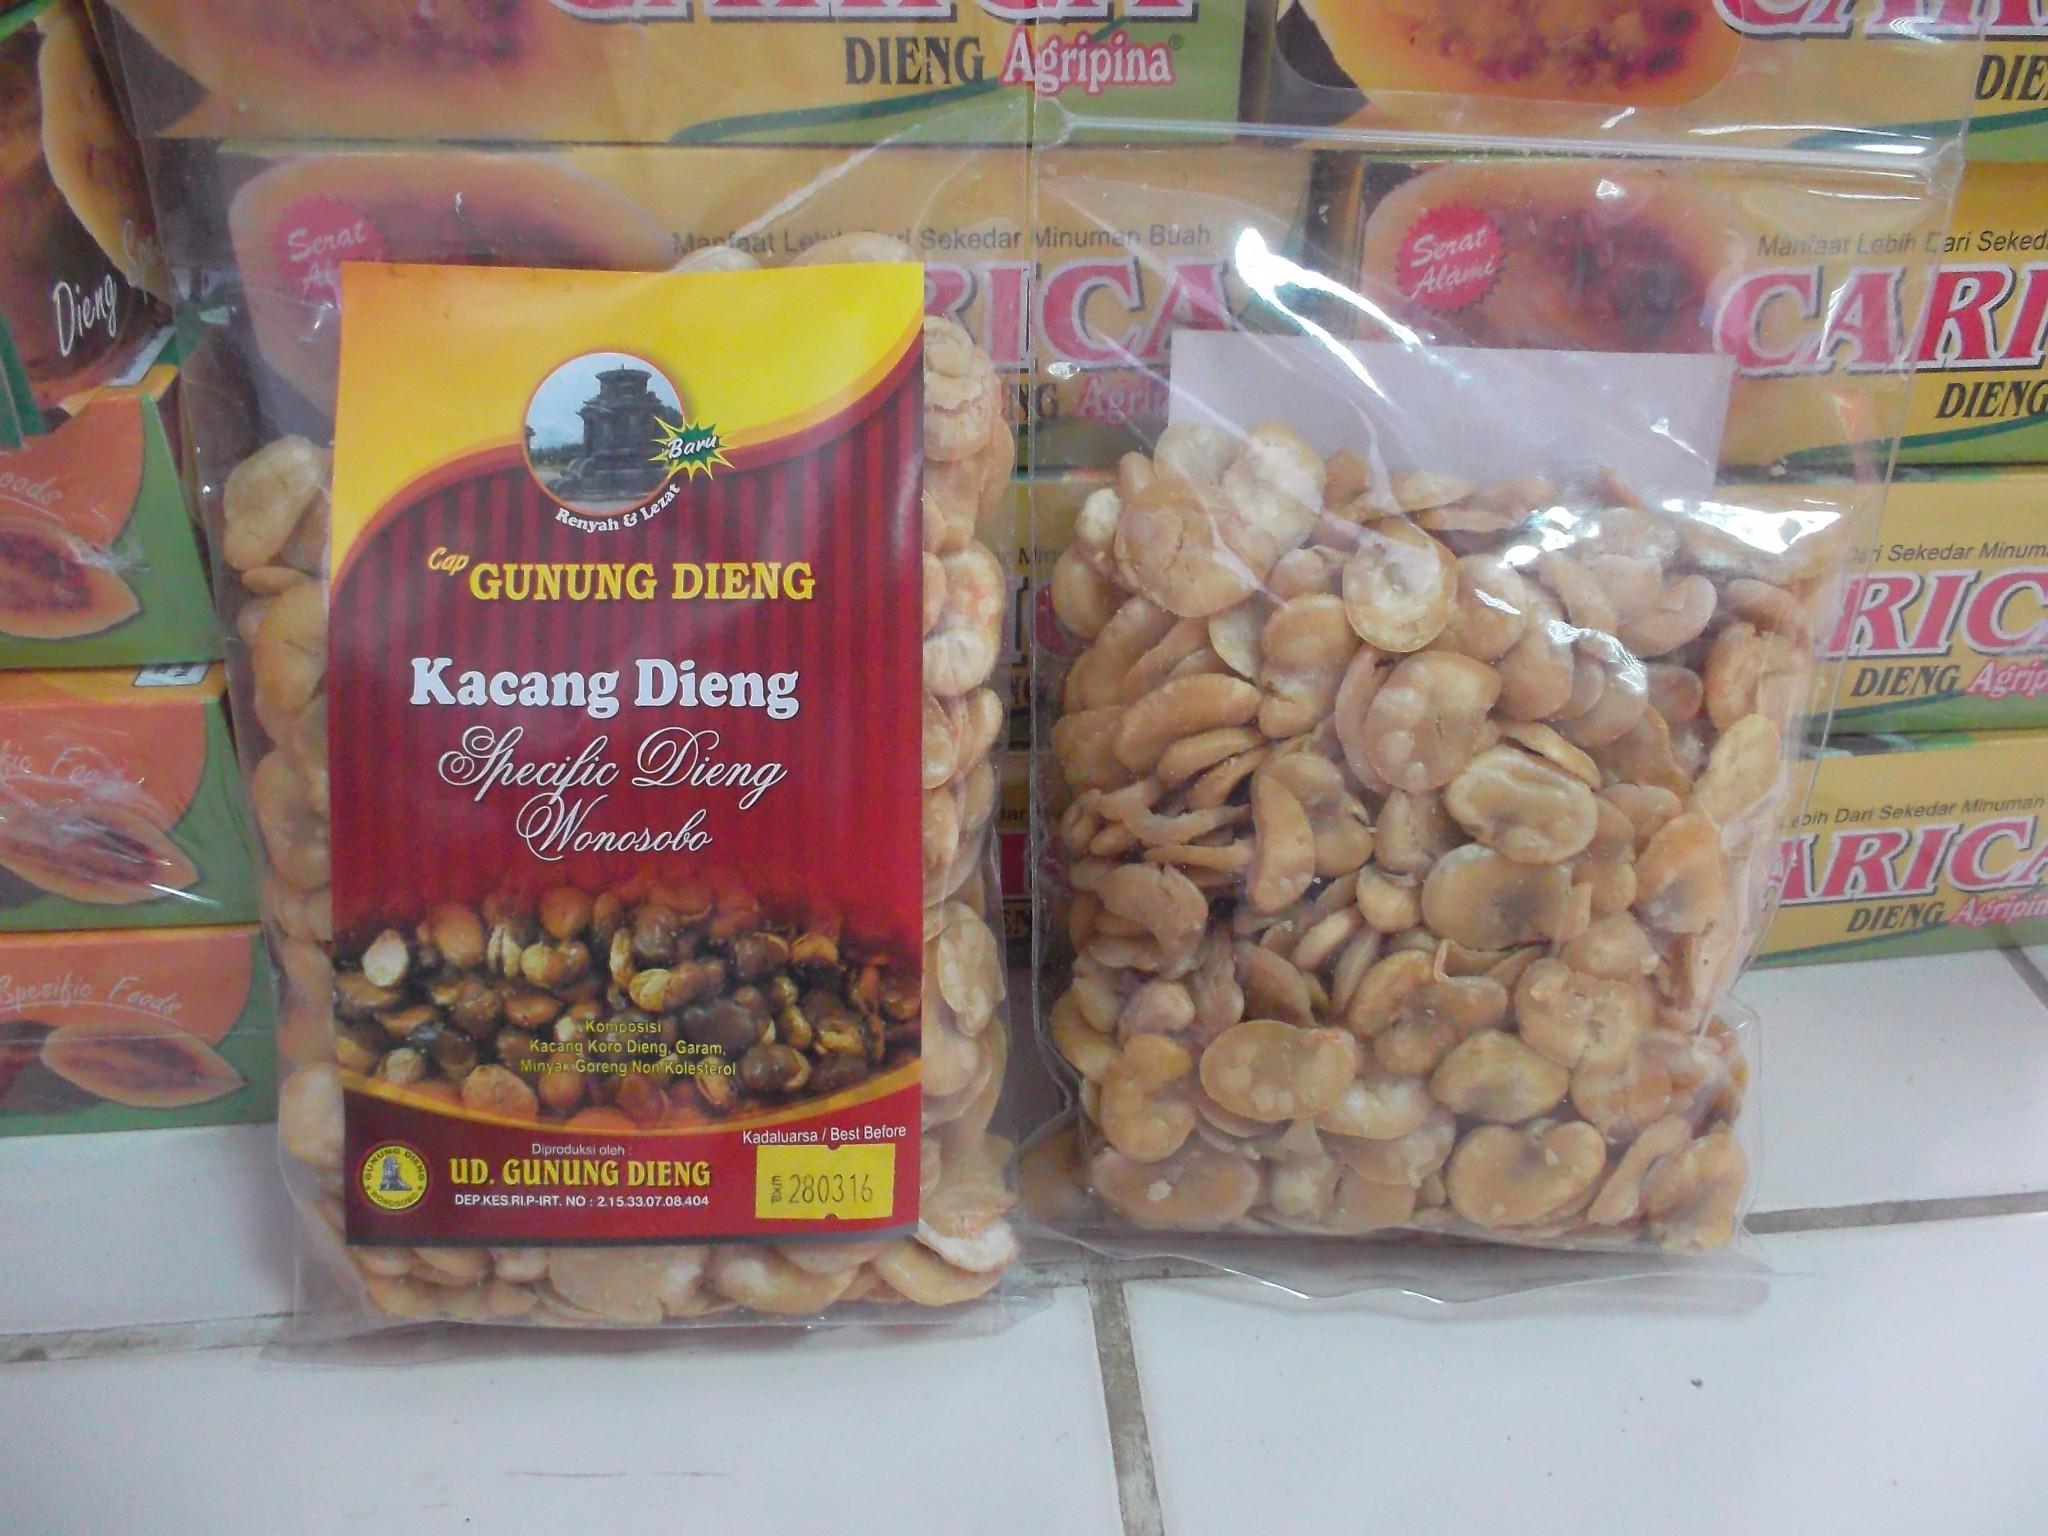 Hasil gambar untuk Kacang Dieng wonosobo